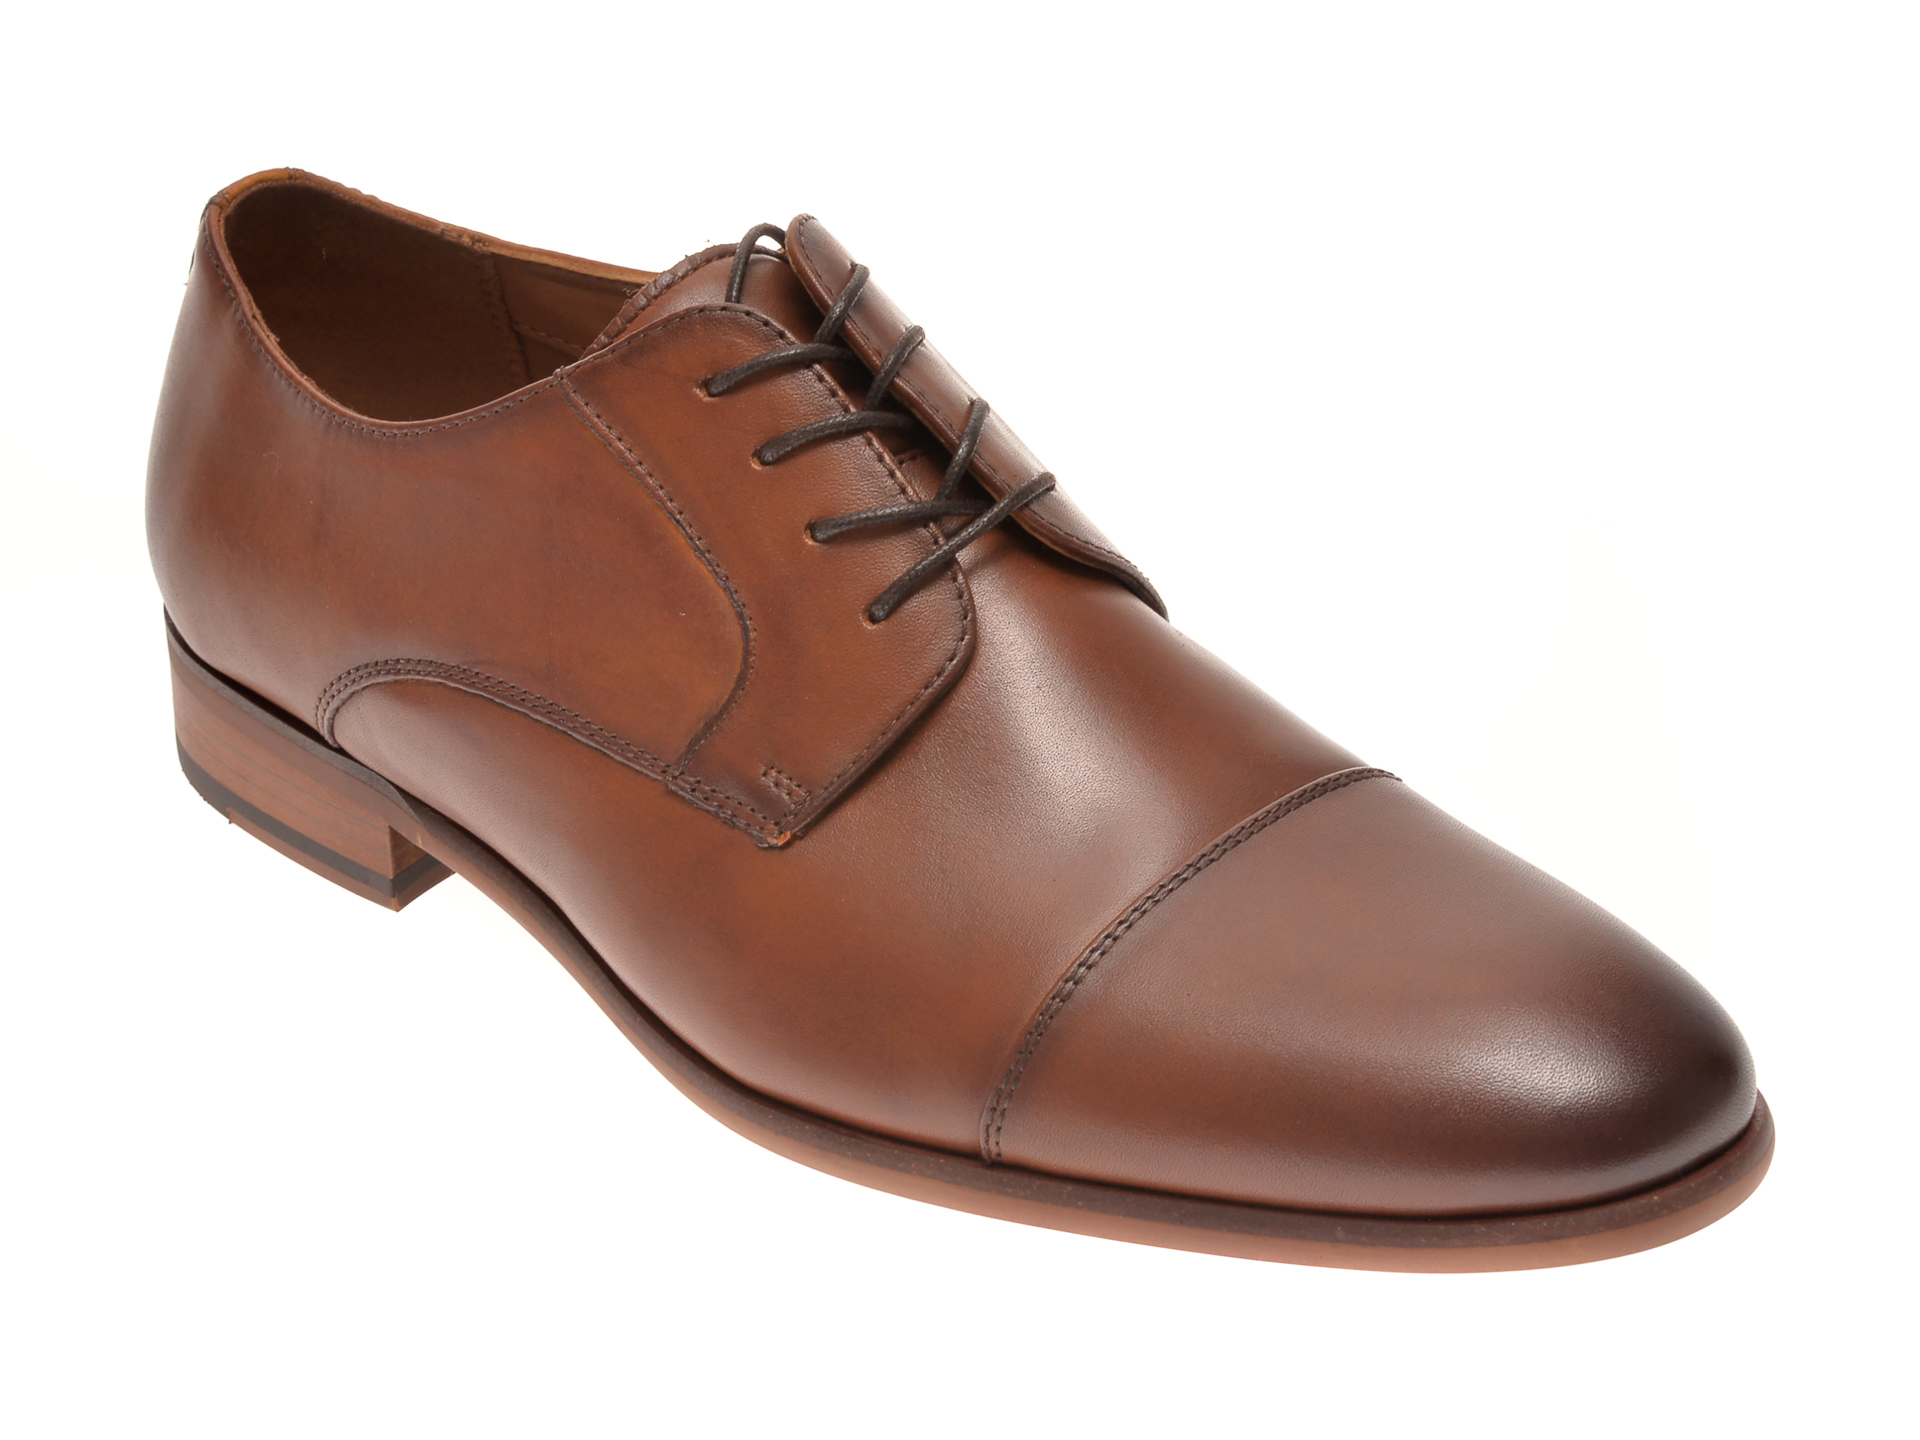 Pantofi ALDO maro, Galerrang-R222, din piele naturala imagine